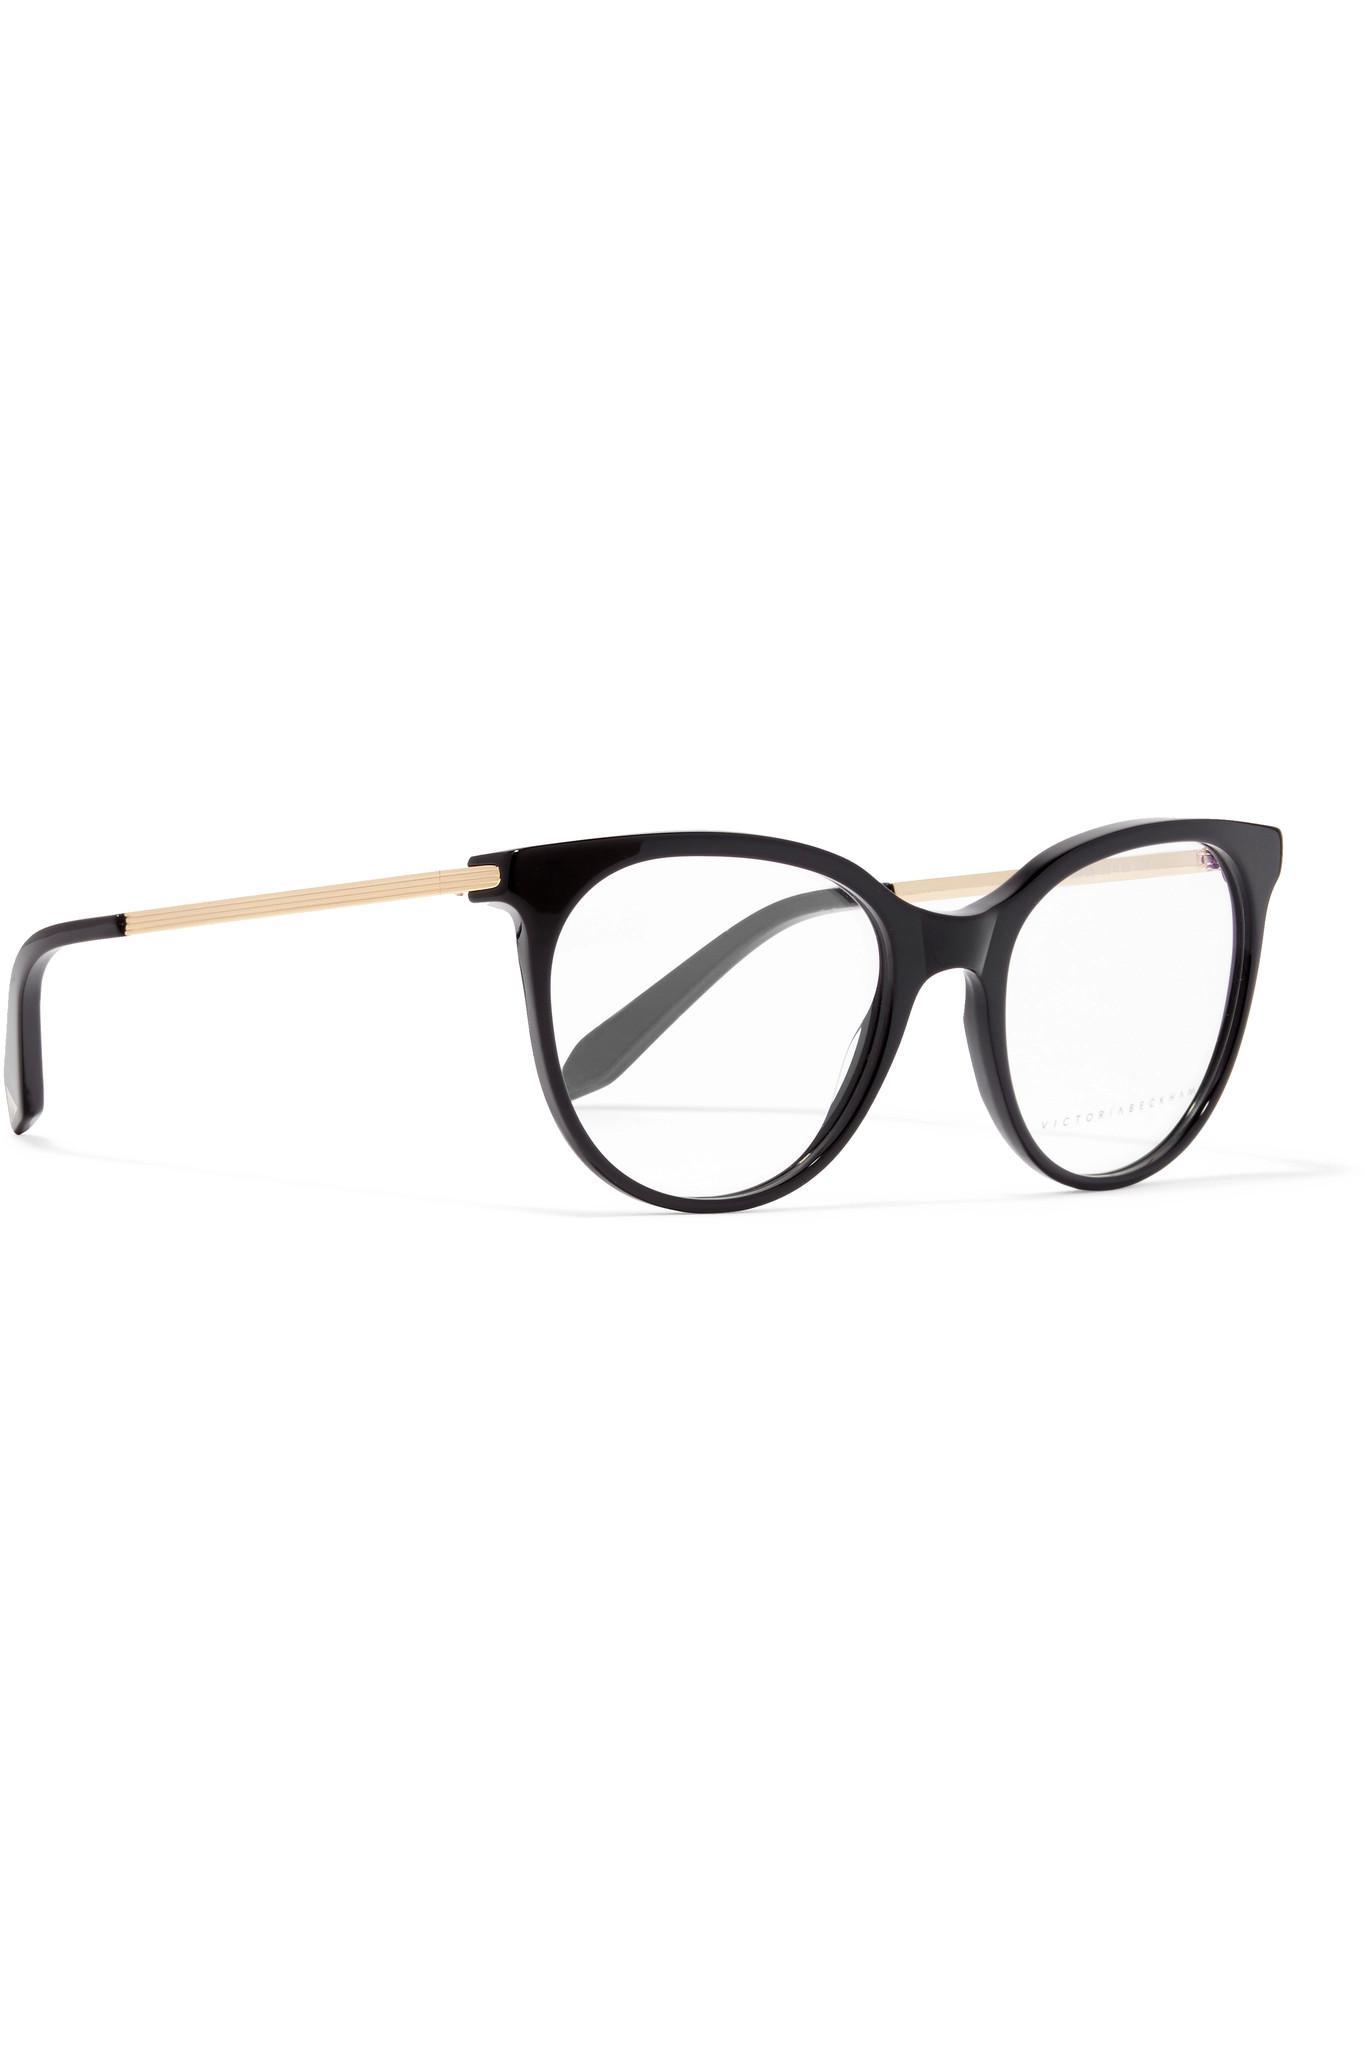 d5a5a7255e470 Victoria Beckham Black Classic Kitten Cat-eye Acetate And Gold-tone Optical  Glasses